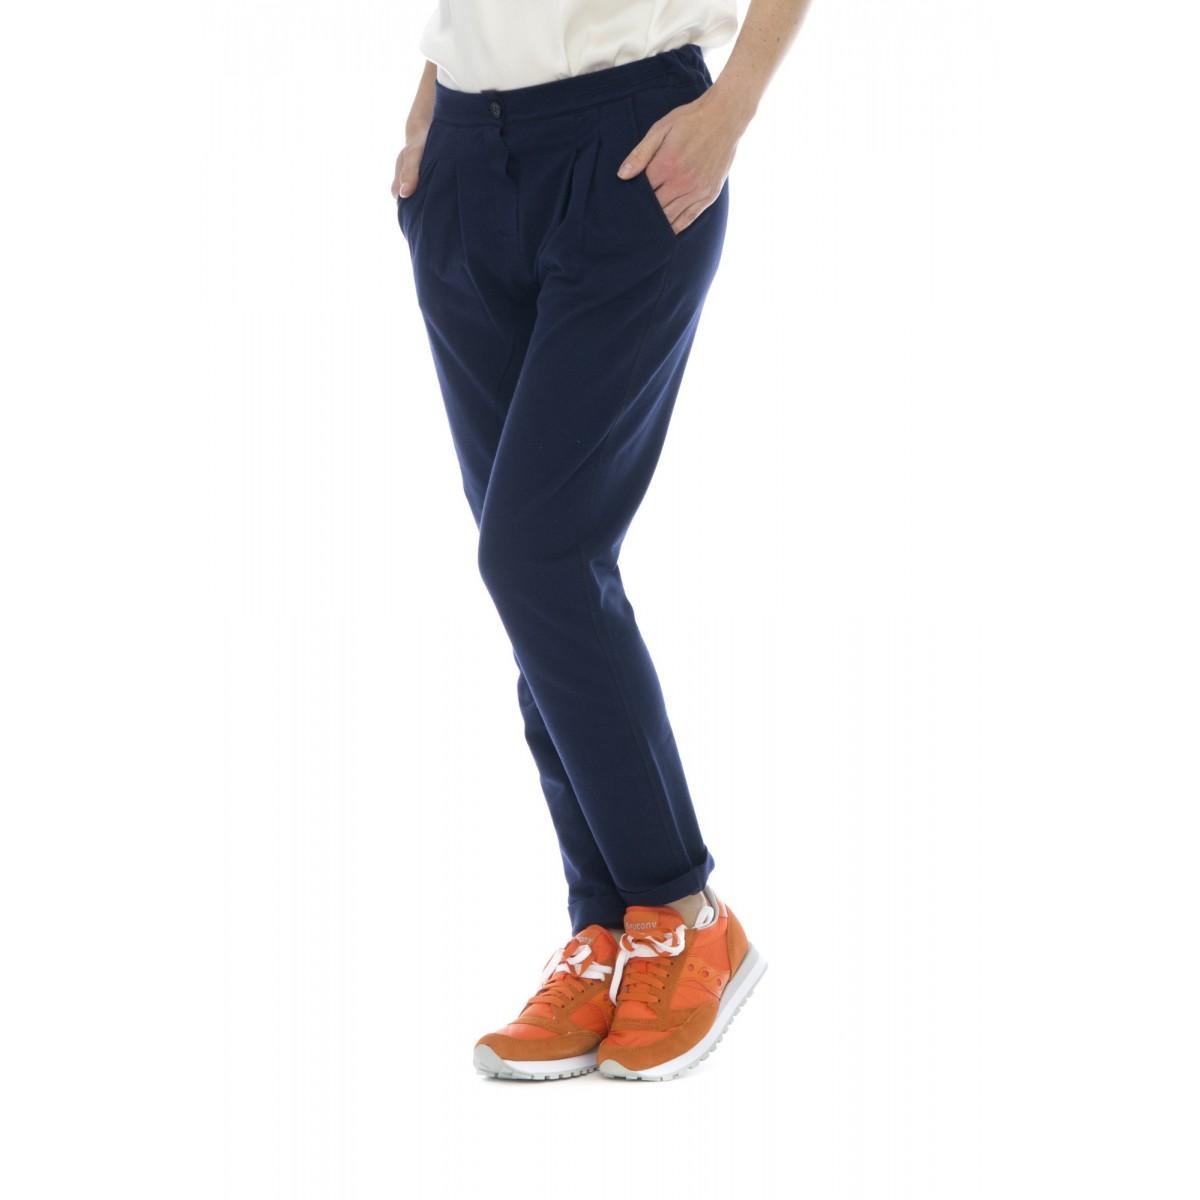 Pantalone donna - 509 fv25 pantalone pence